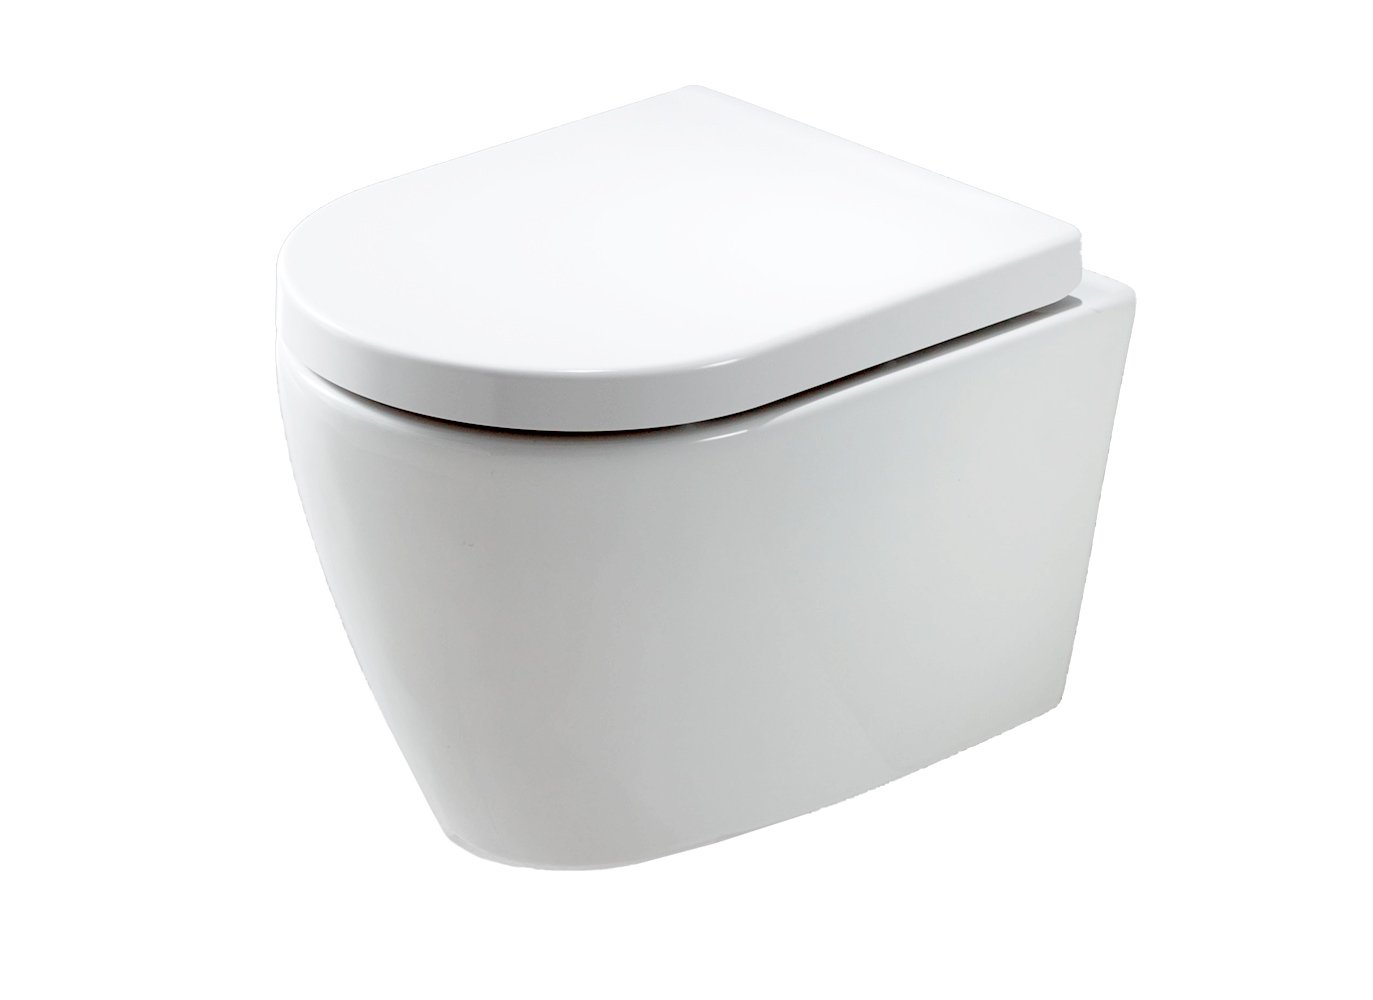 Wand-Hänge-WC B-8030 Weiß - inkl. Softclose-Deckel